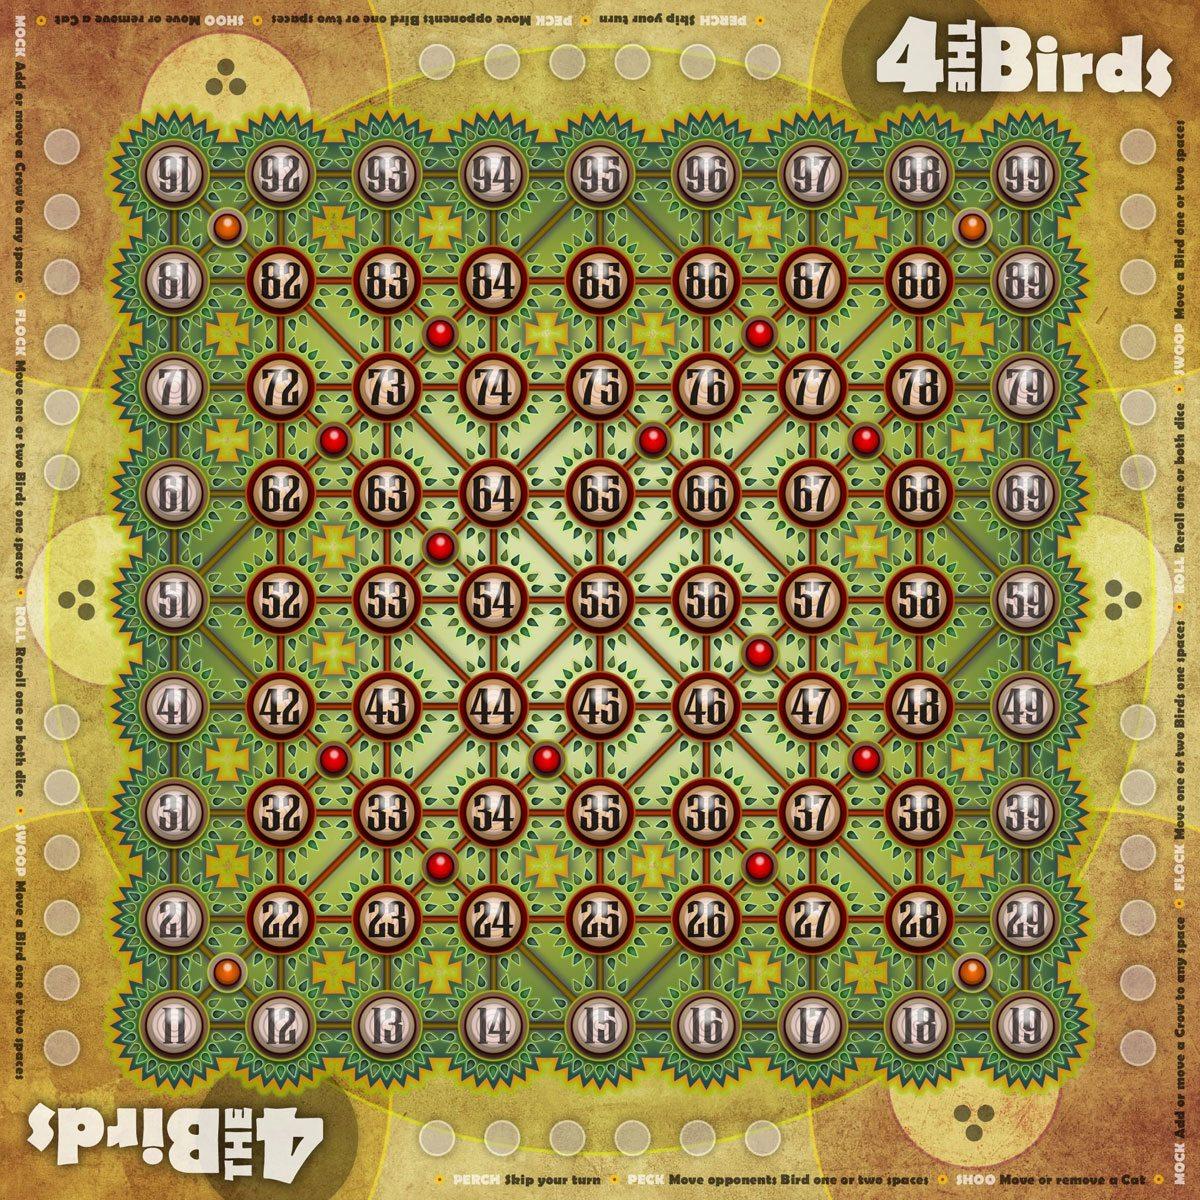 4 the birds board